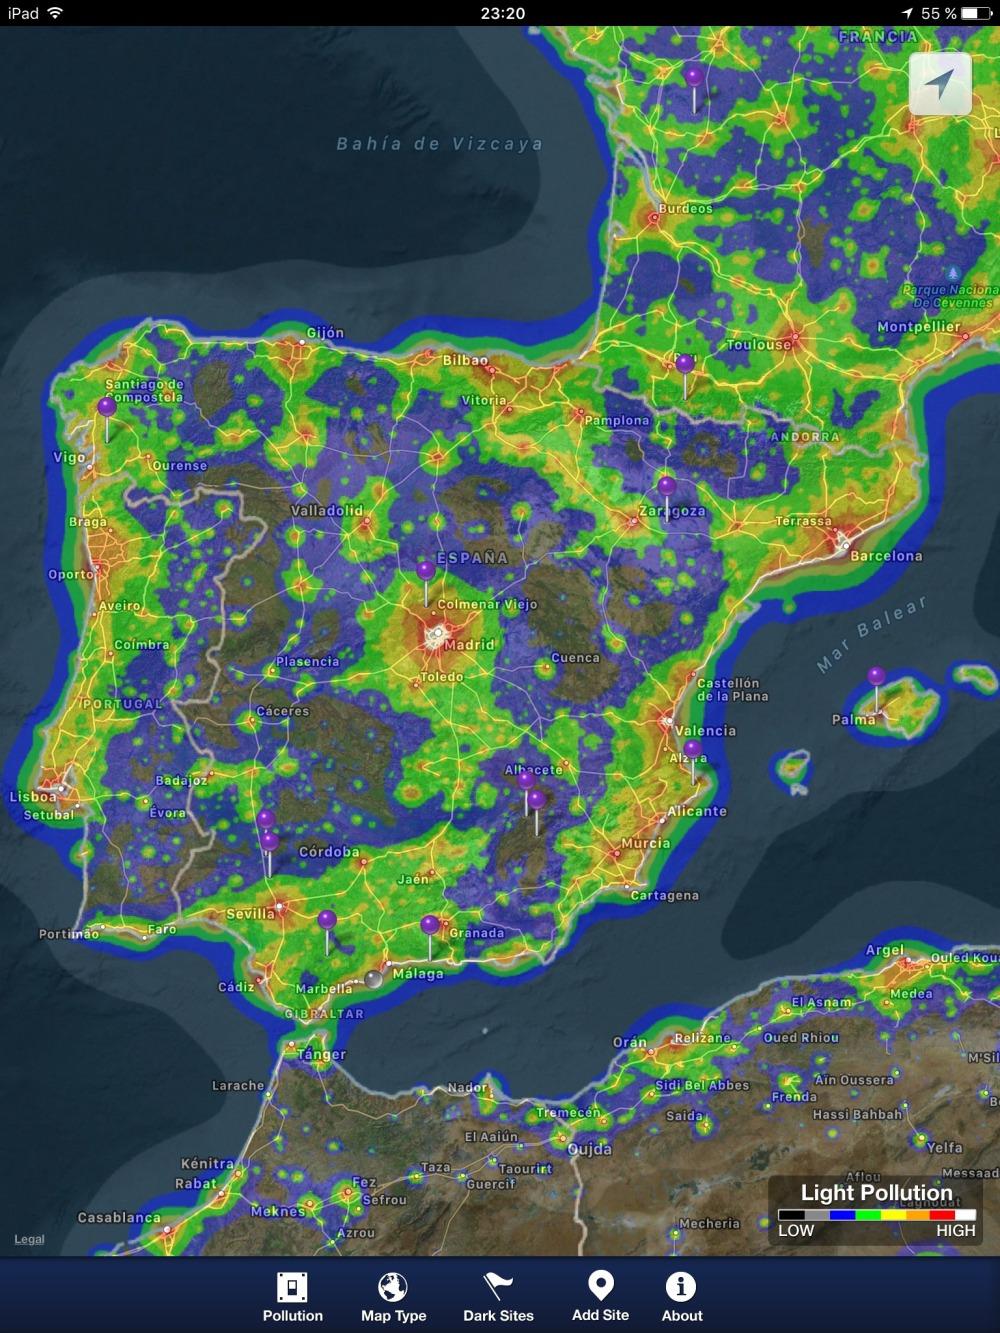 Contaminación lumínica en España